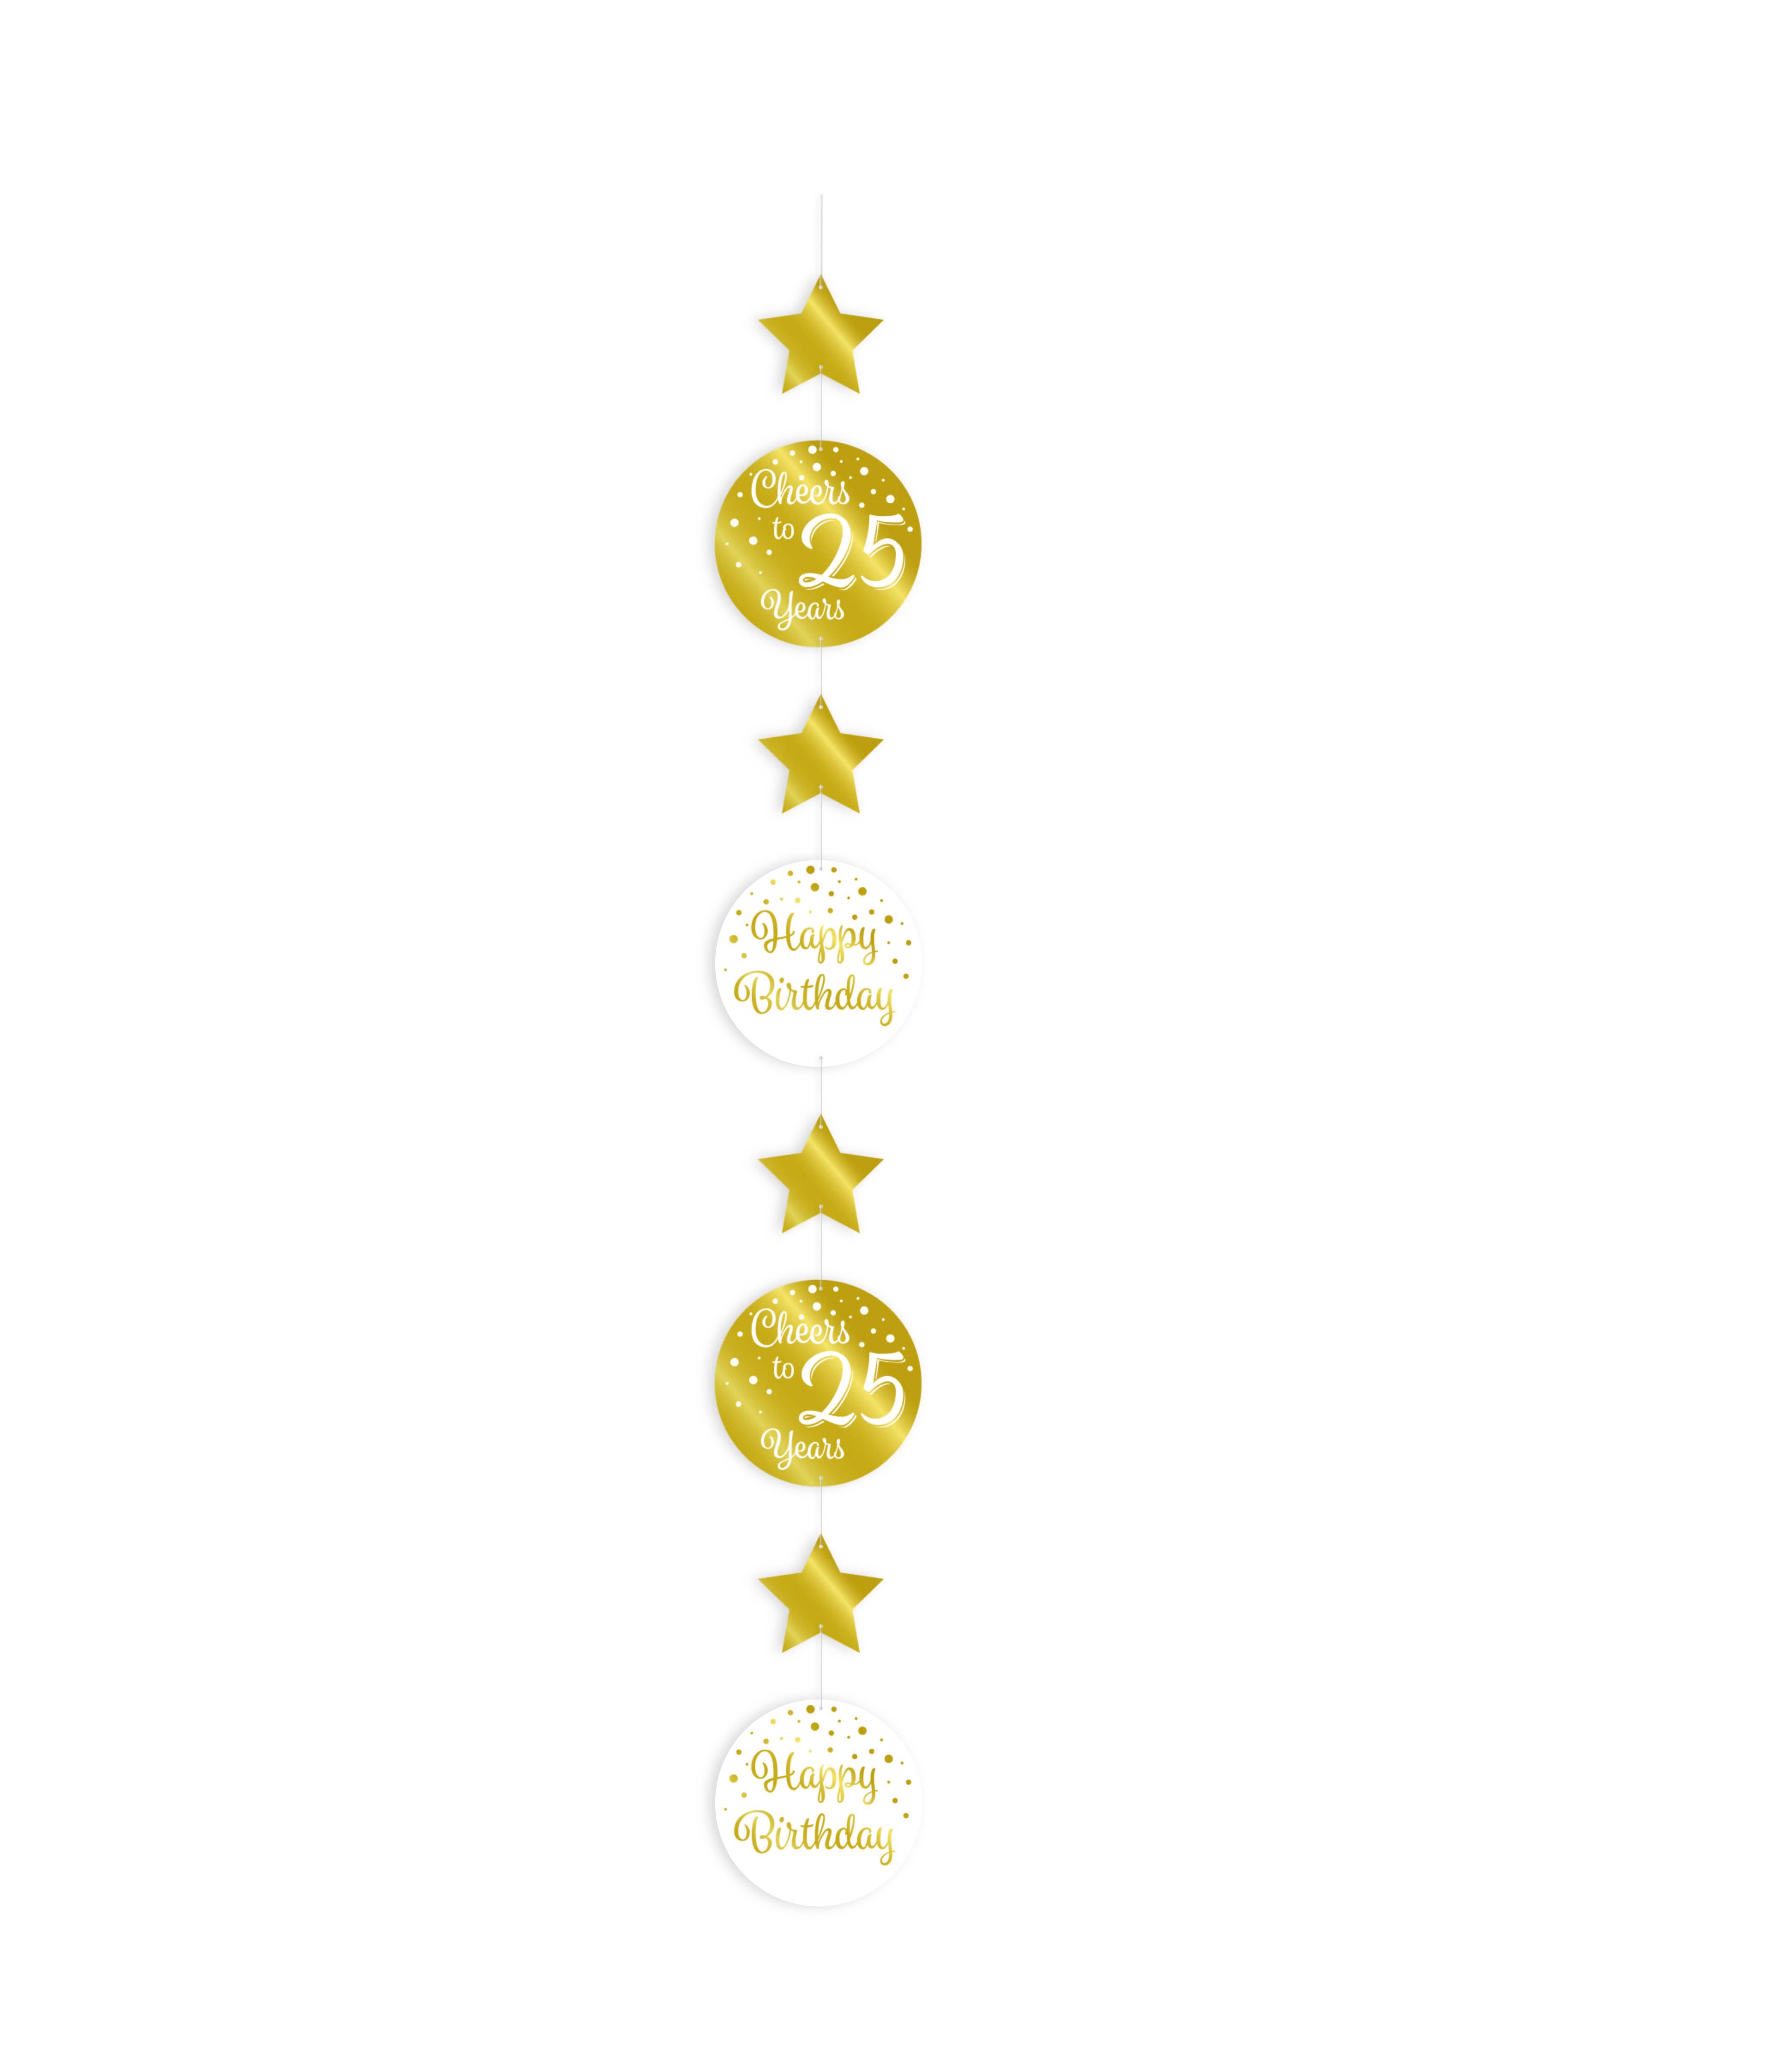 Hangdecoratie Goud/Wit Cheers to 25 Years